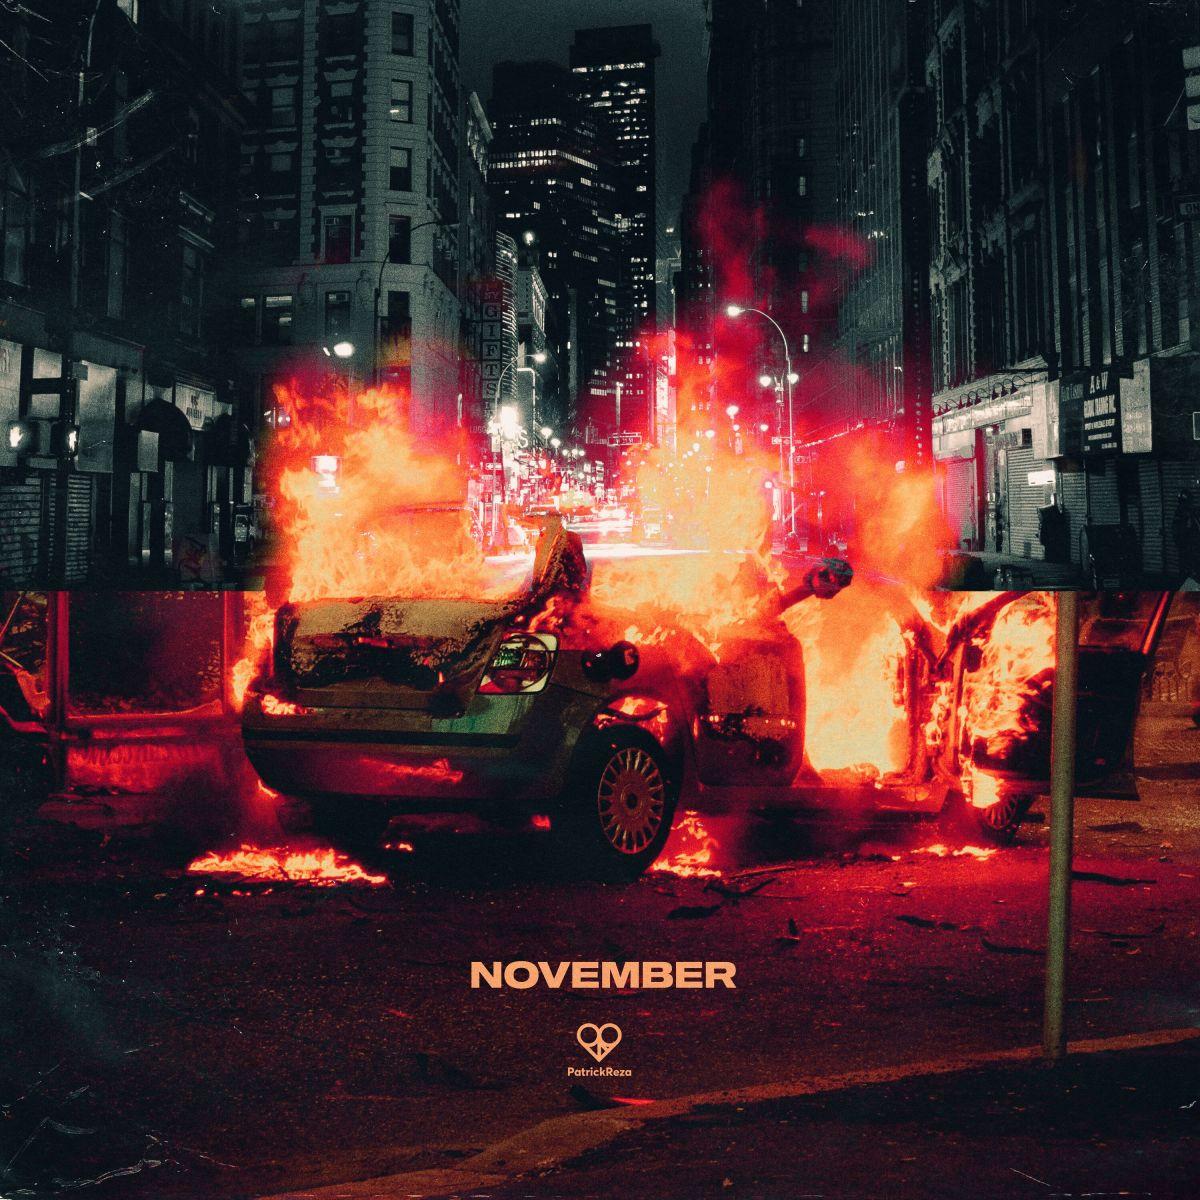 PatrickReza November Album Art